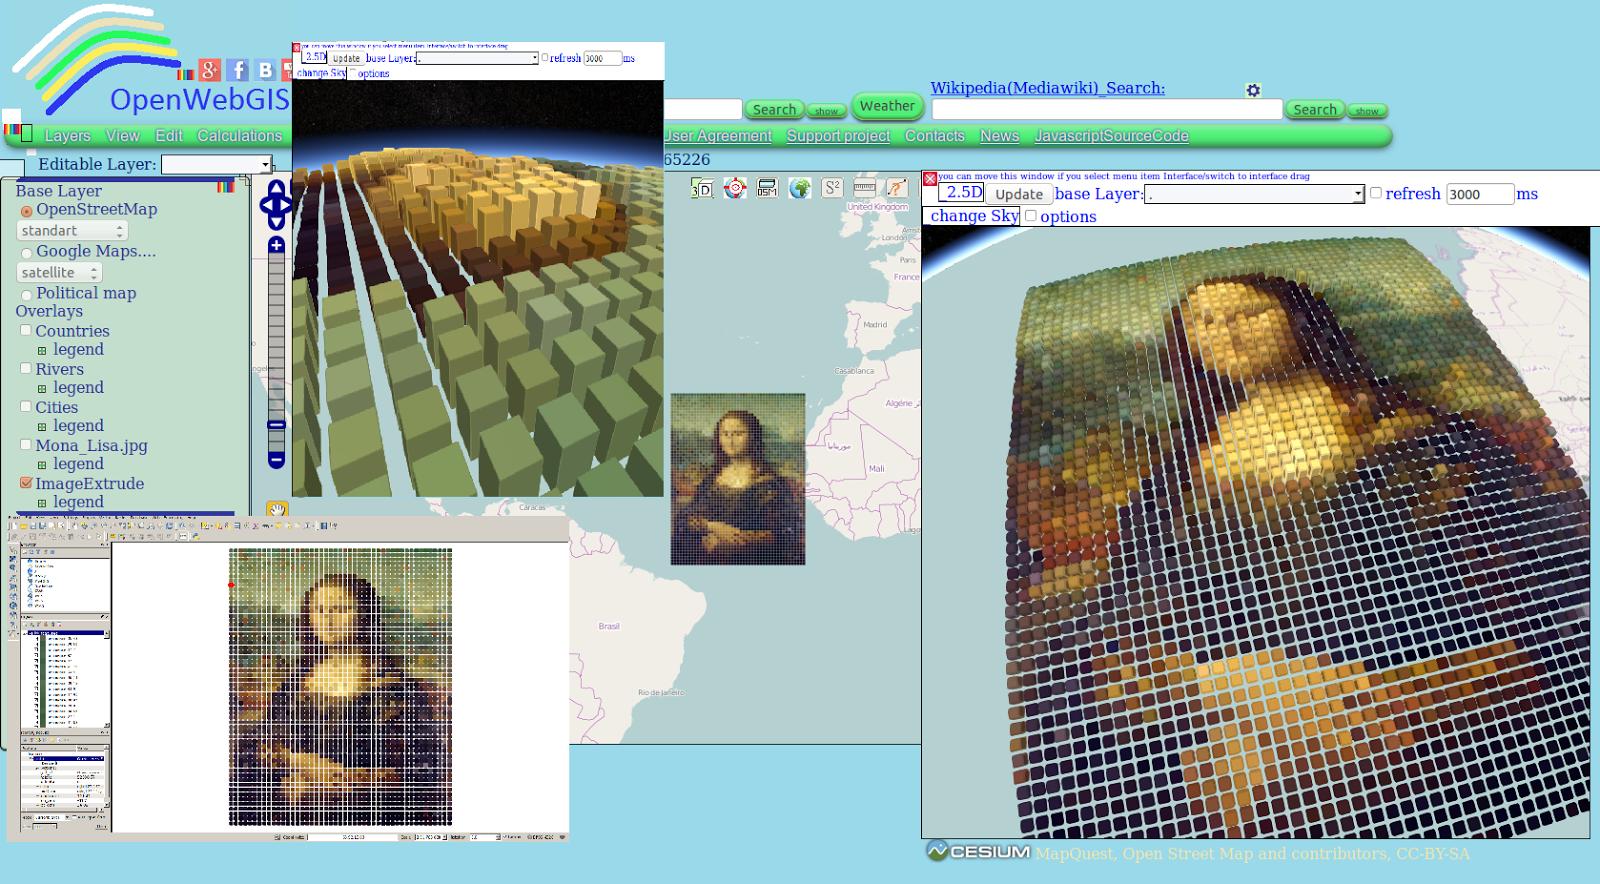 OpenWebGIS is free online GIS: Mona Lisa on the map of